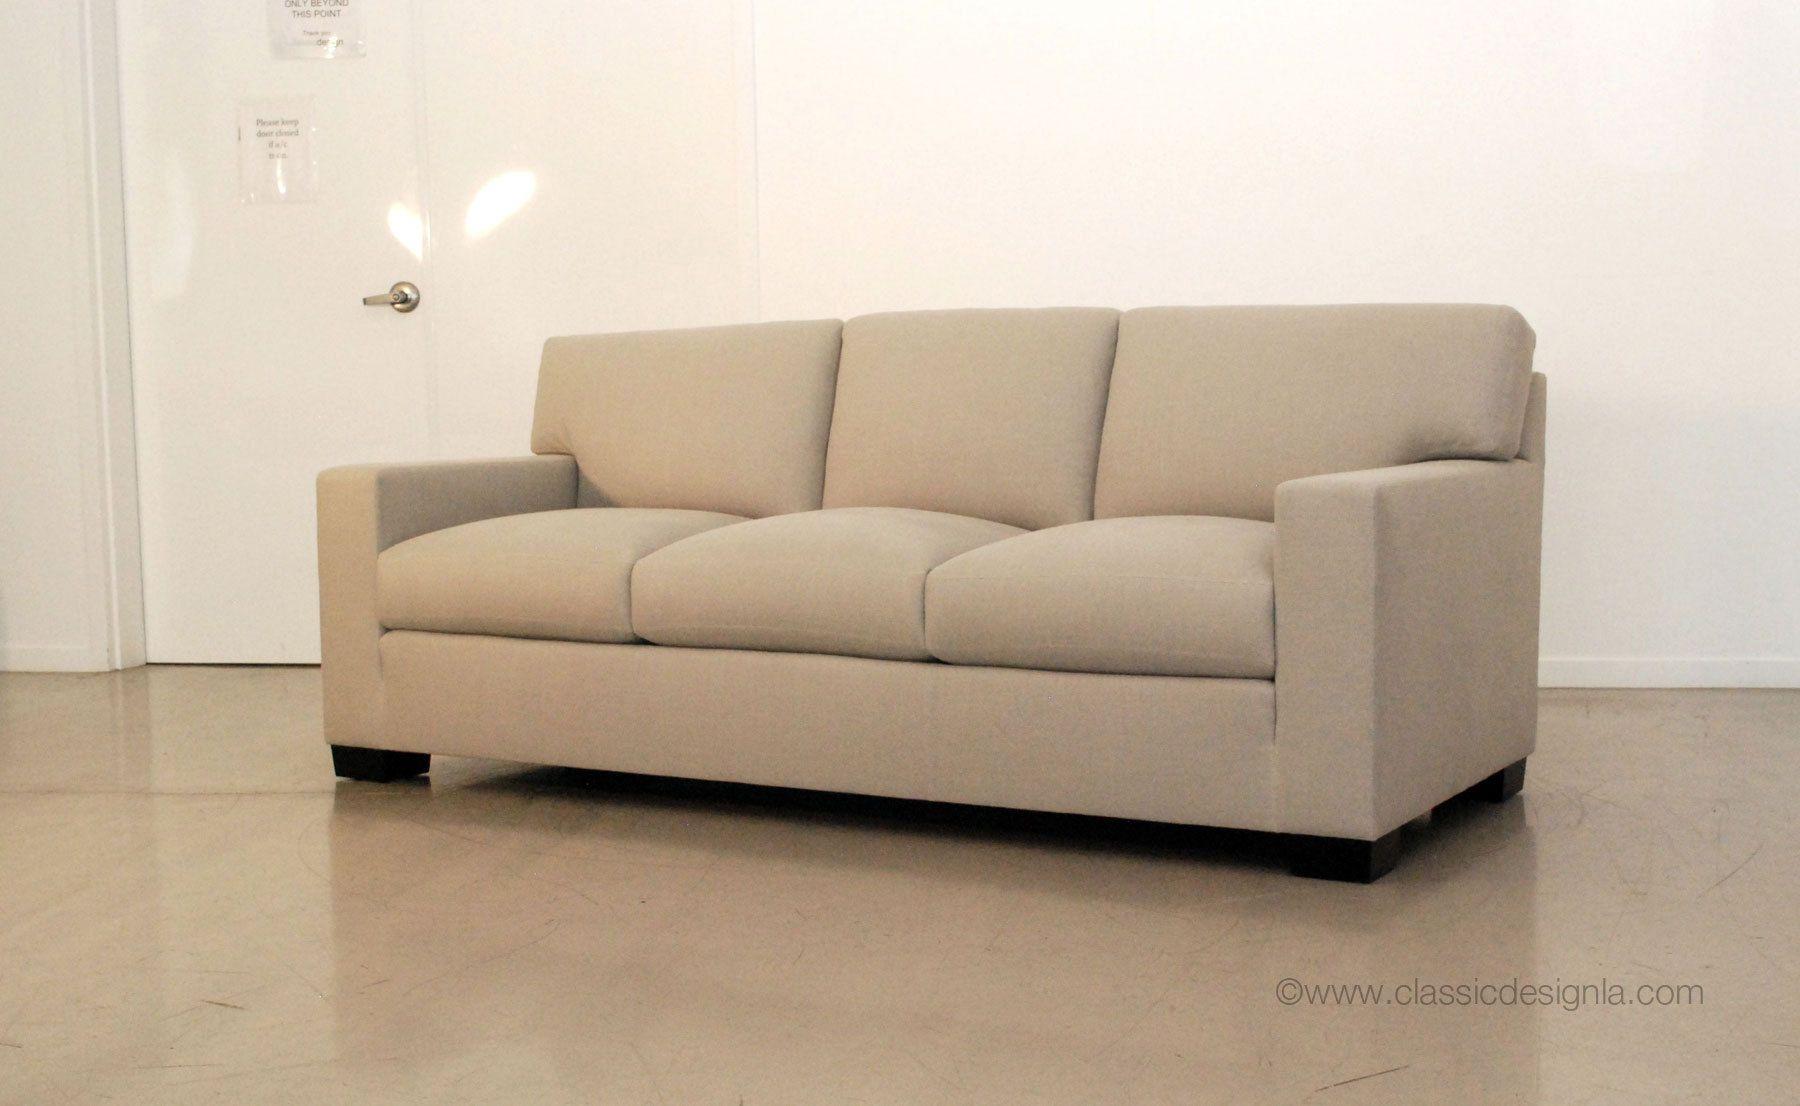 Classic JMF Sofa